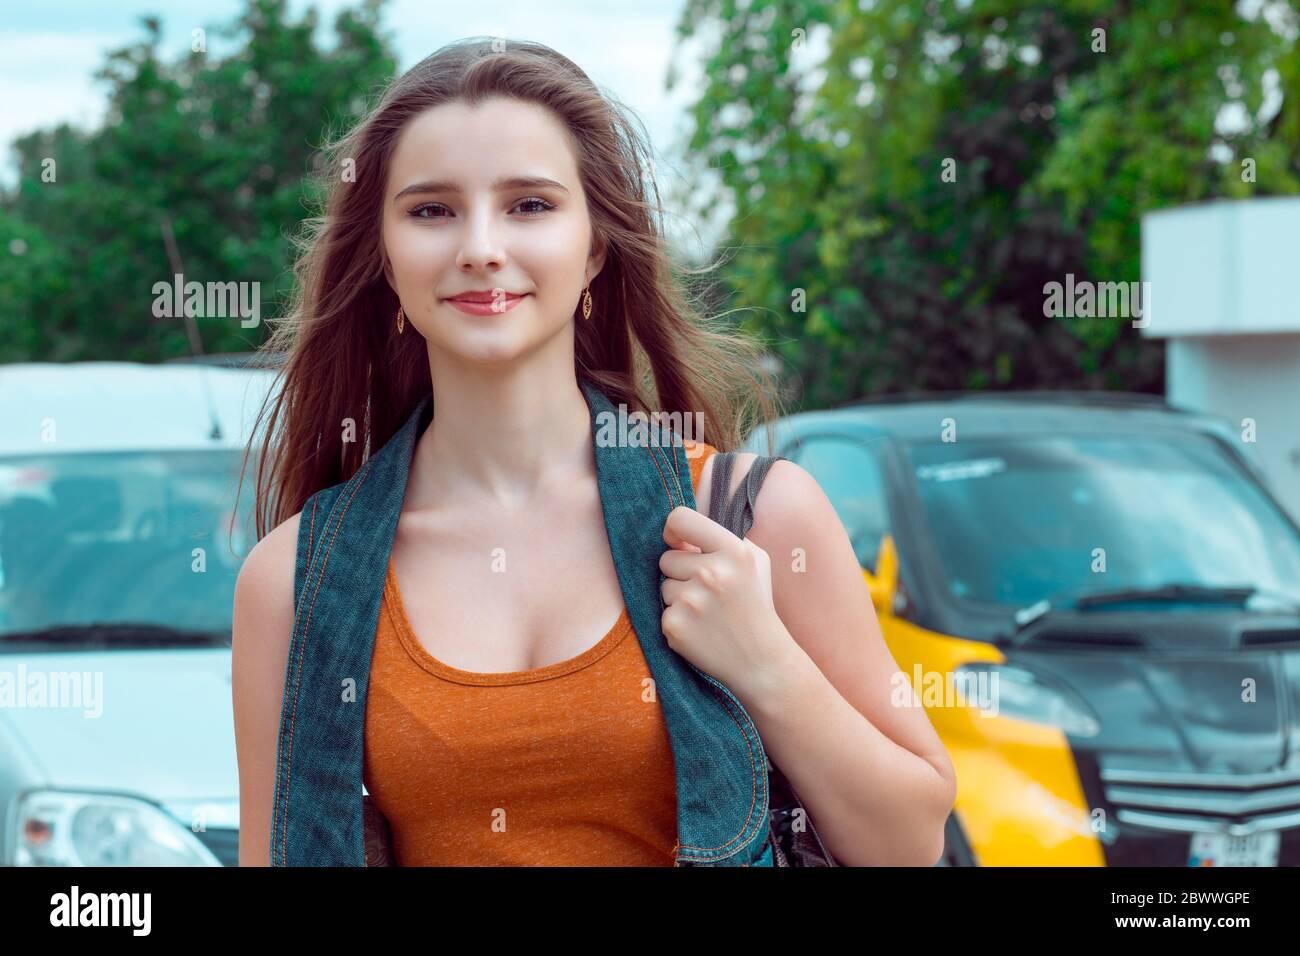 schone teen beugte sich uber